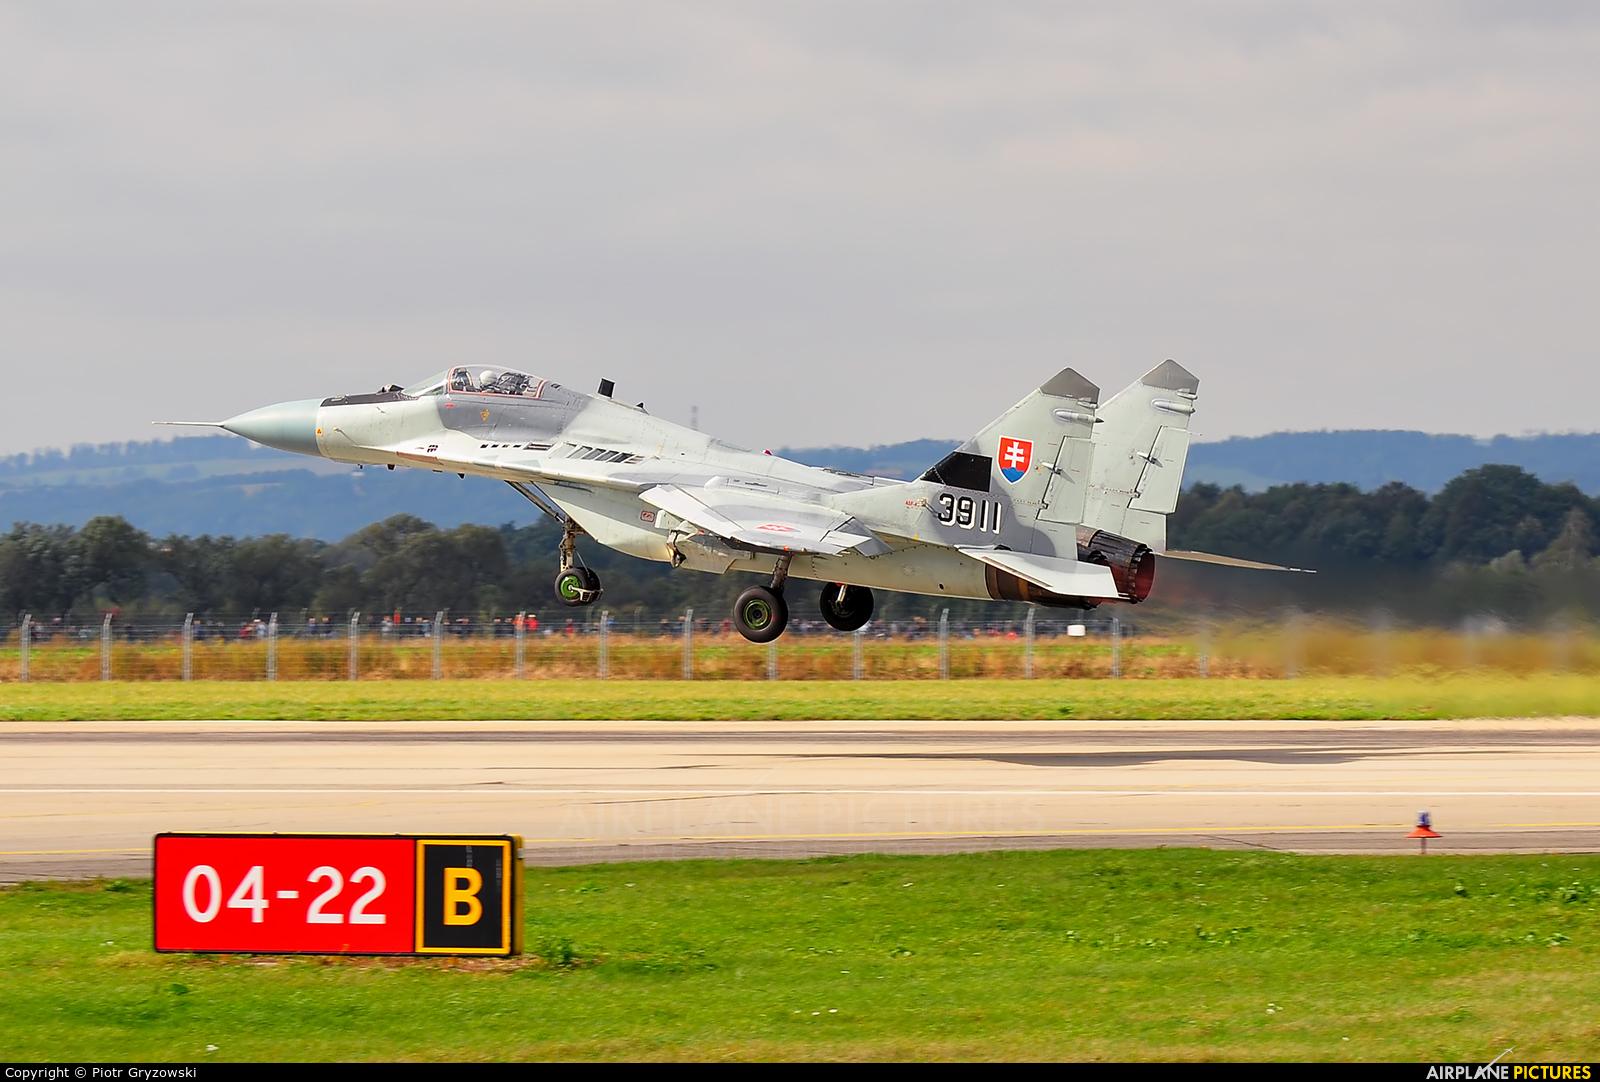 Slovakia -  Air Force 3911 aircraft at Ostrava Mošnov